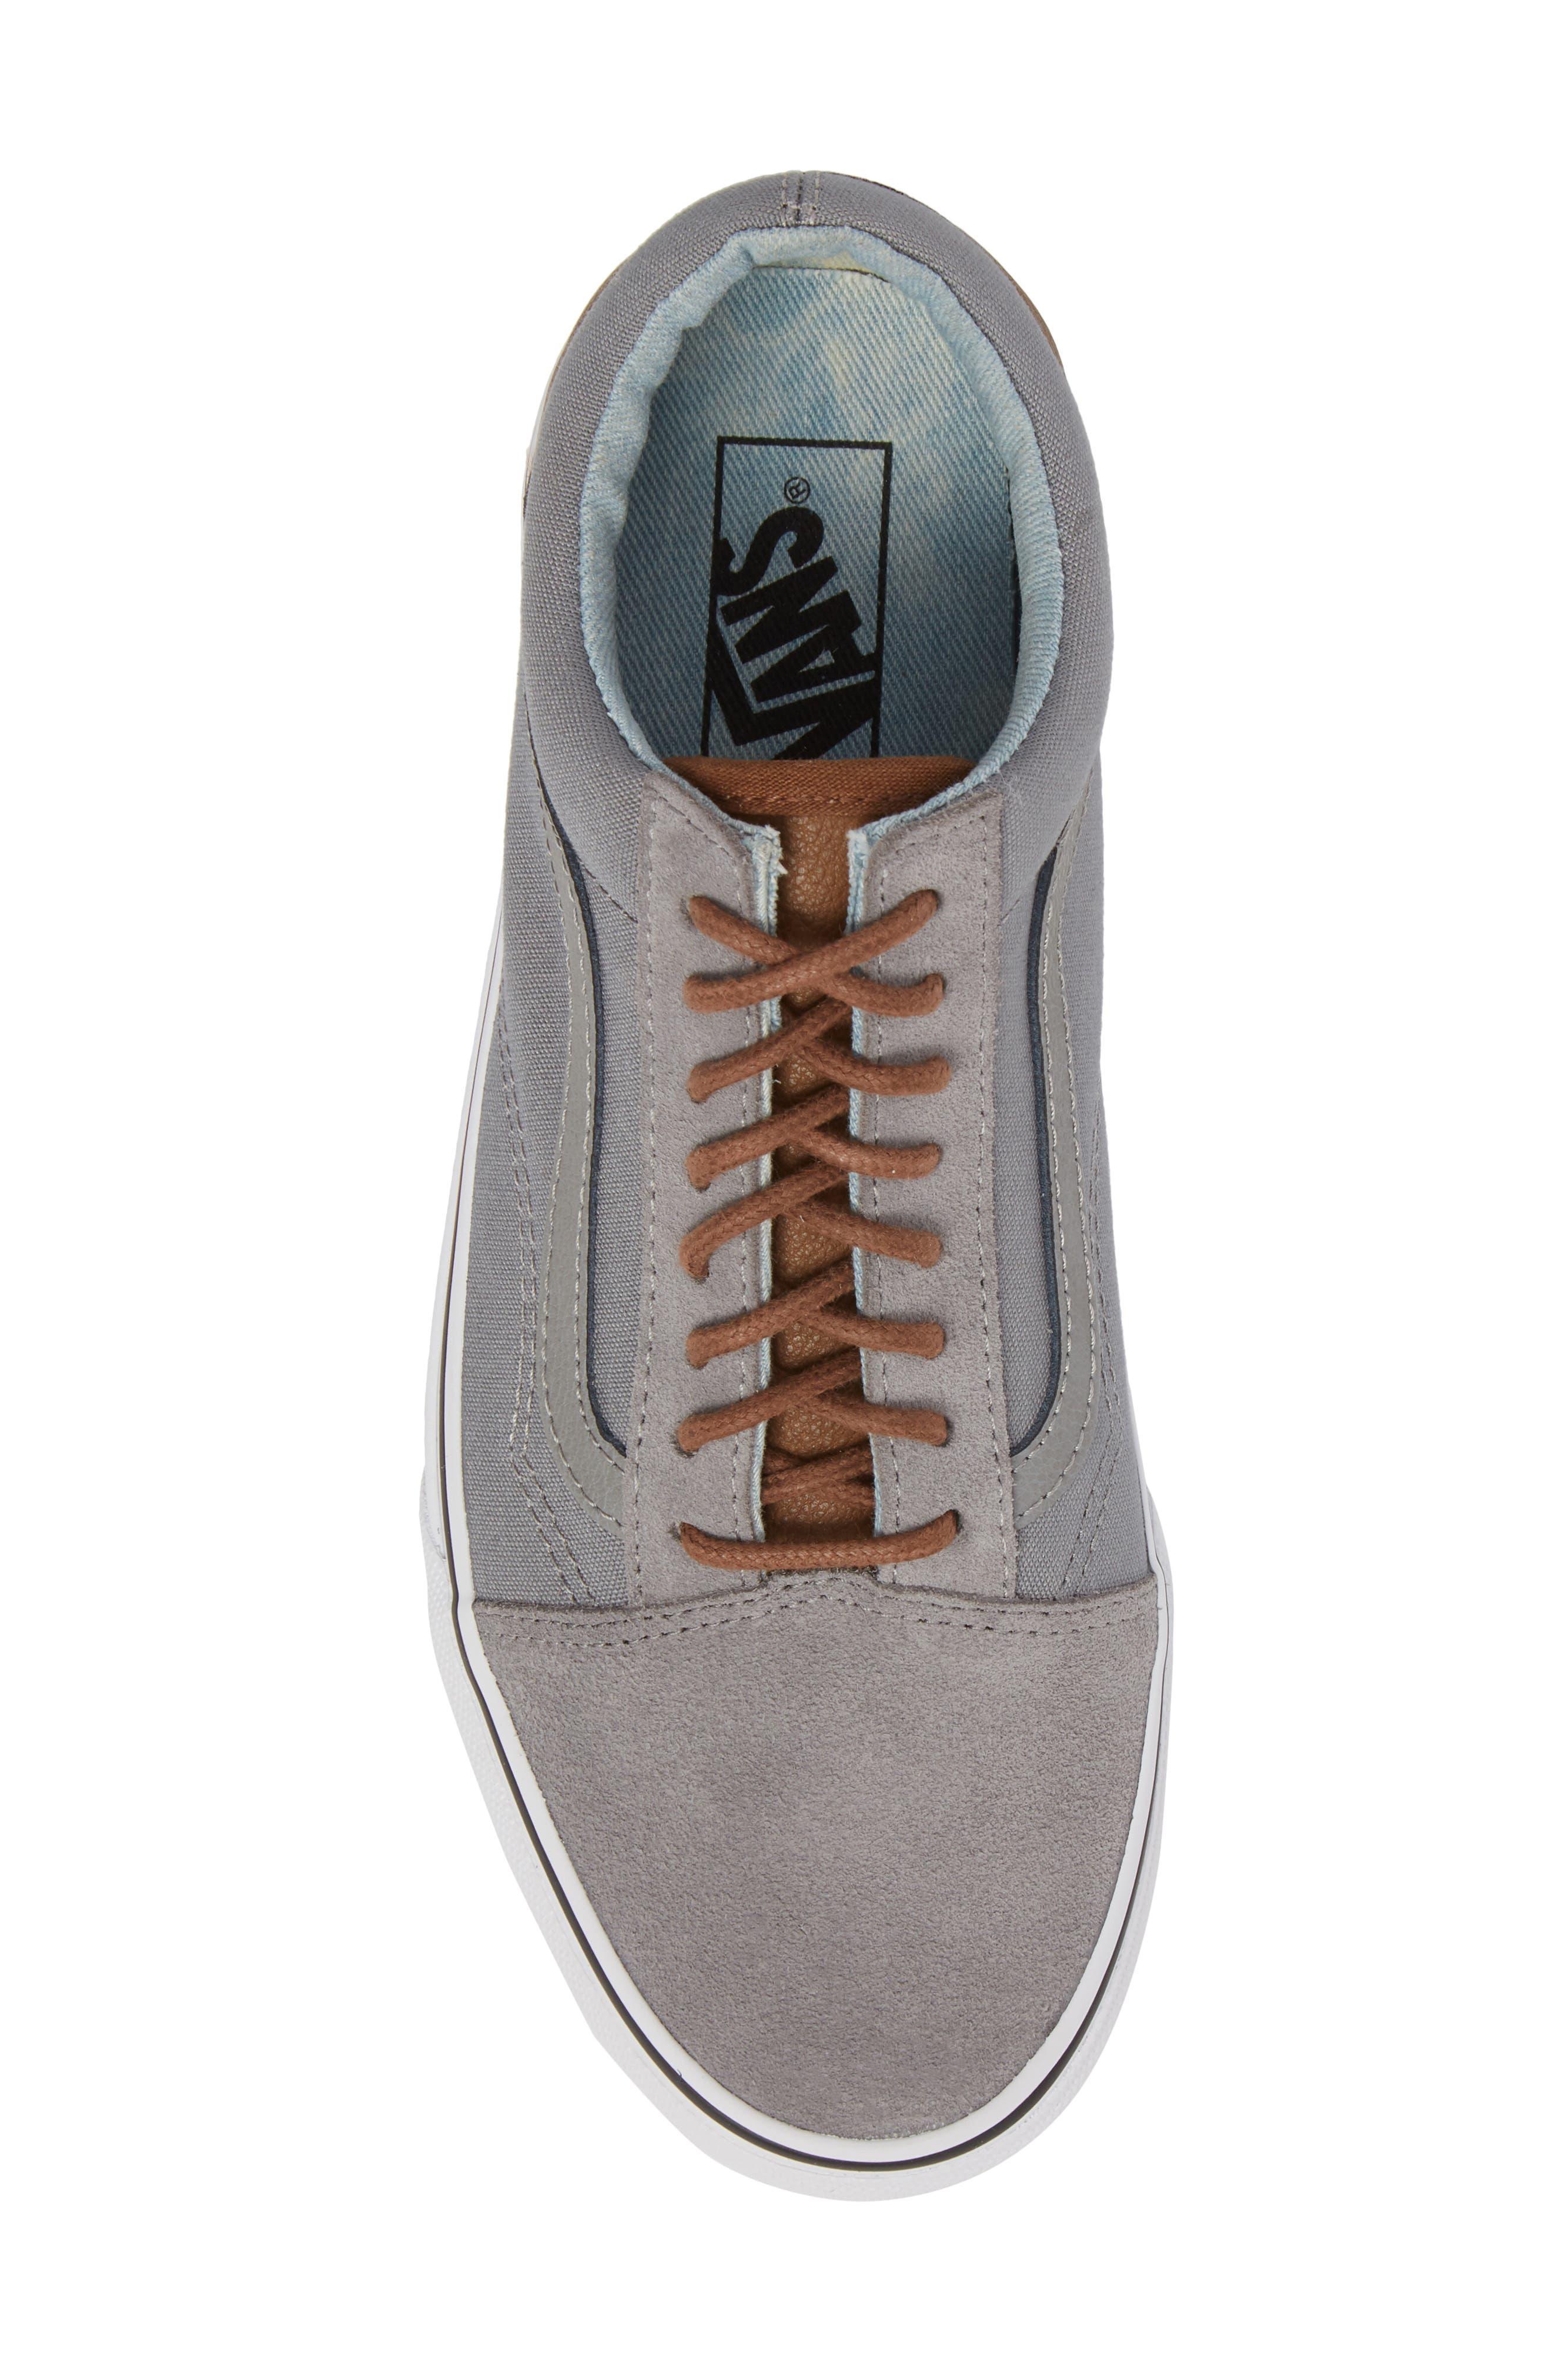 Old Skool Low Top Sneaker,                             Alternate thumbnail 5, color,                             Frost Grey/ Acid Denim Leather